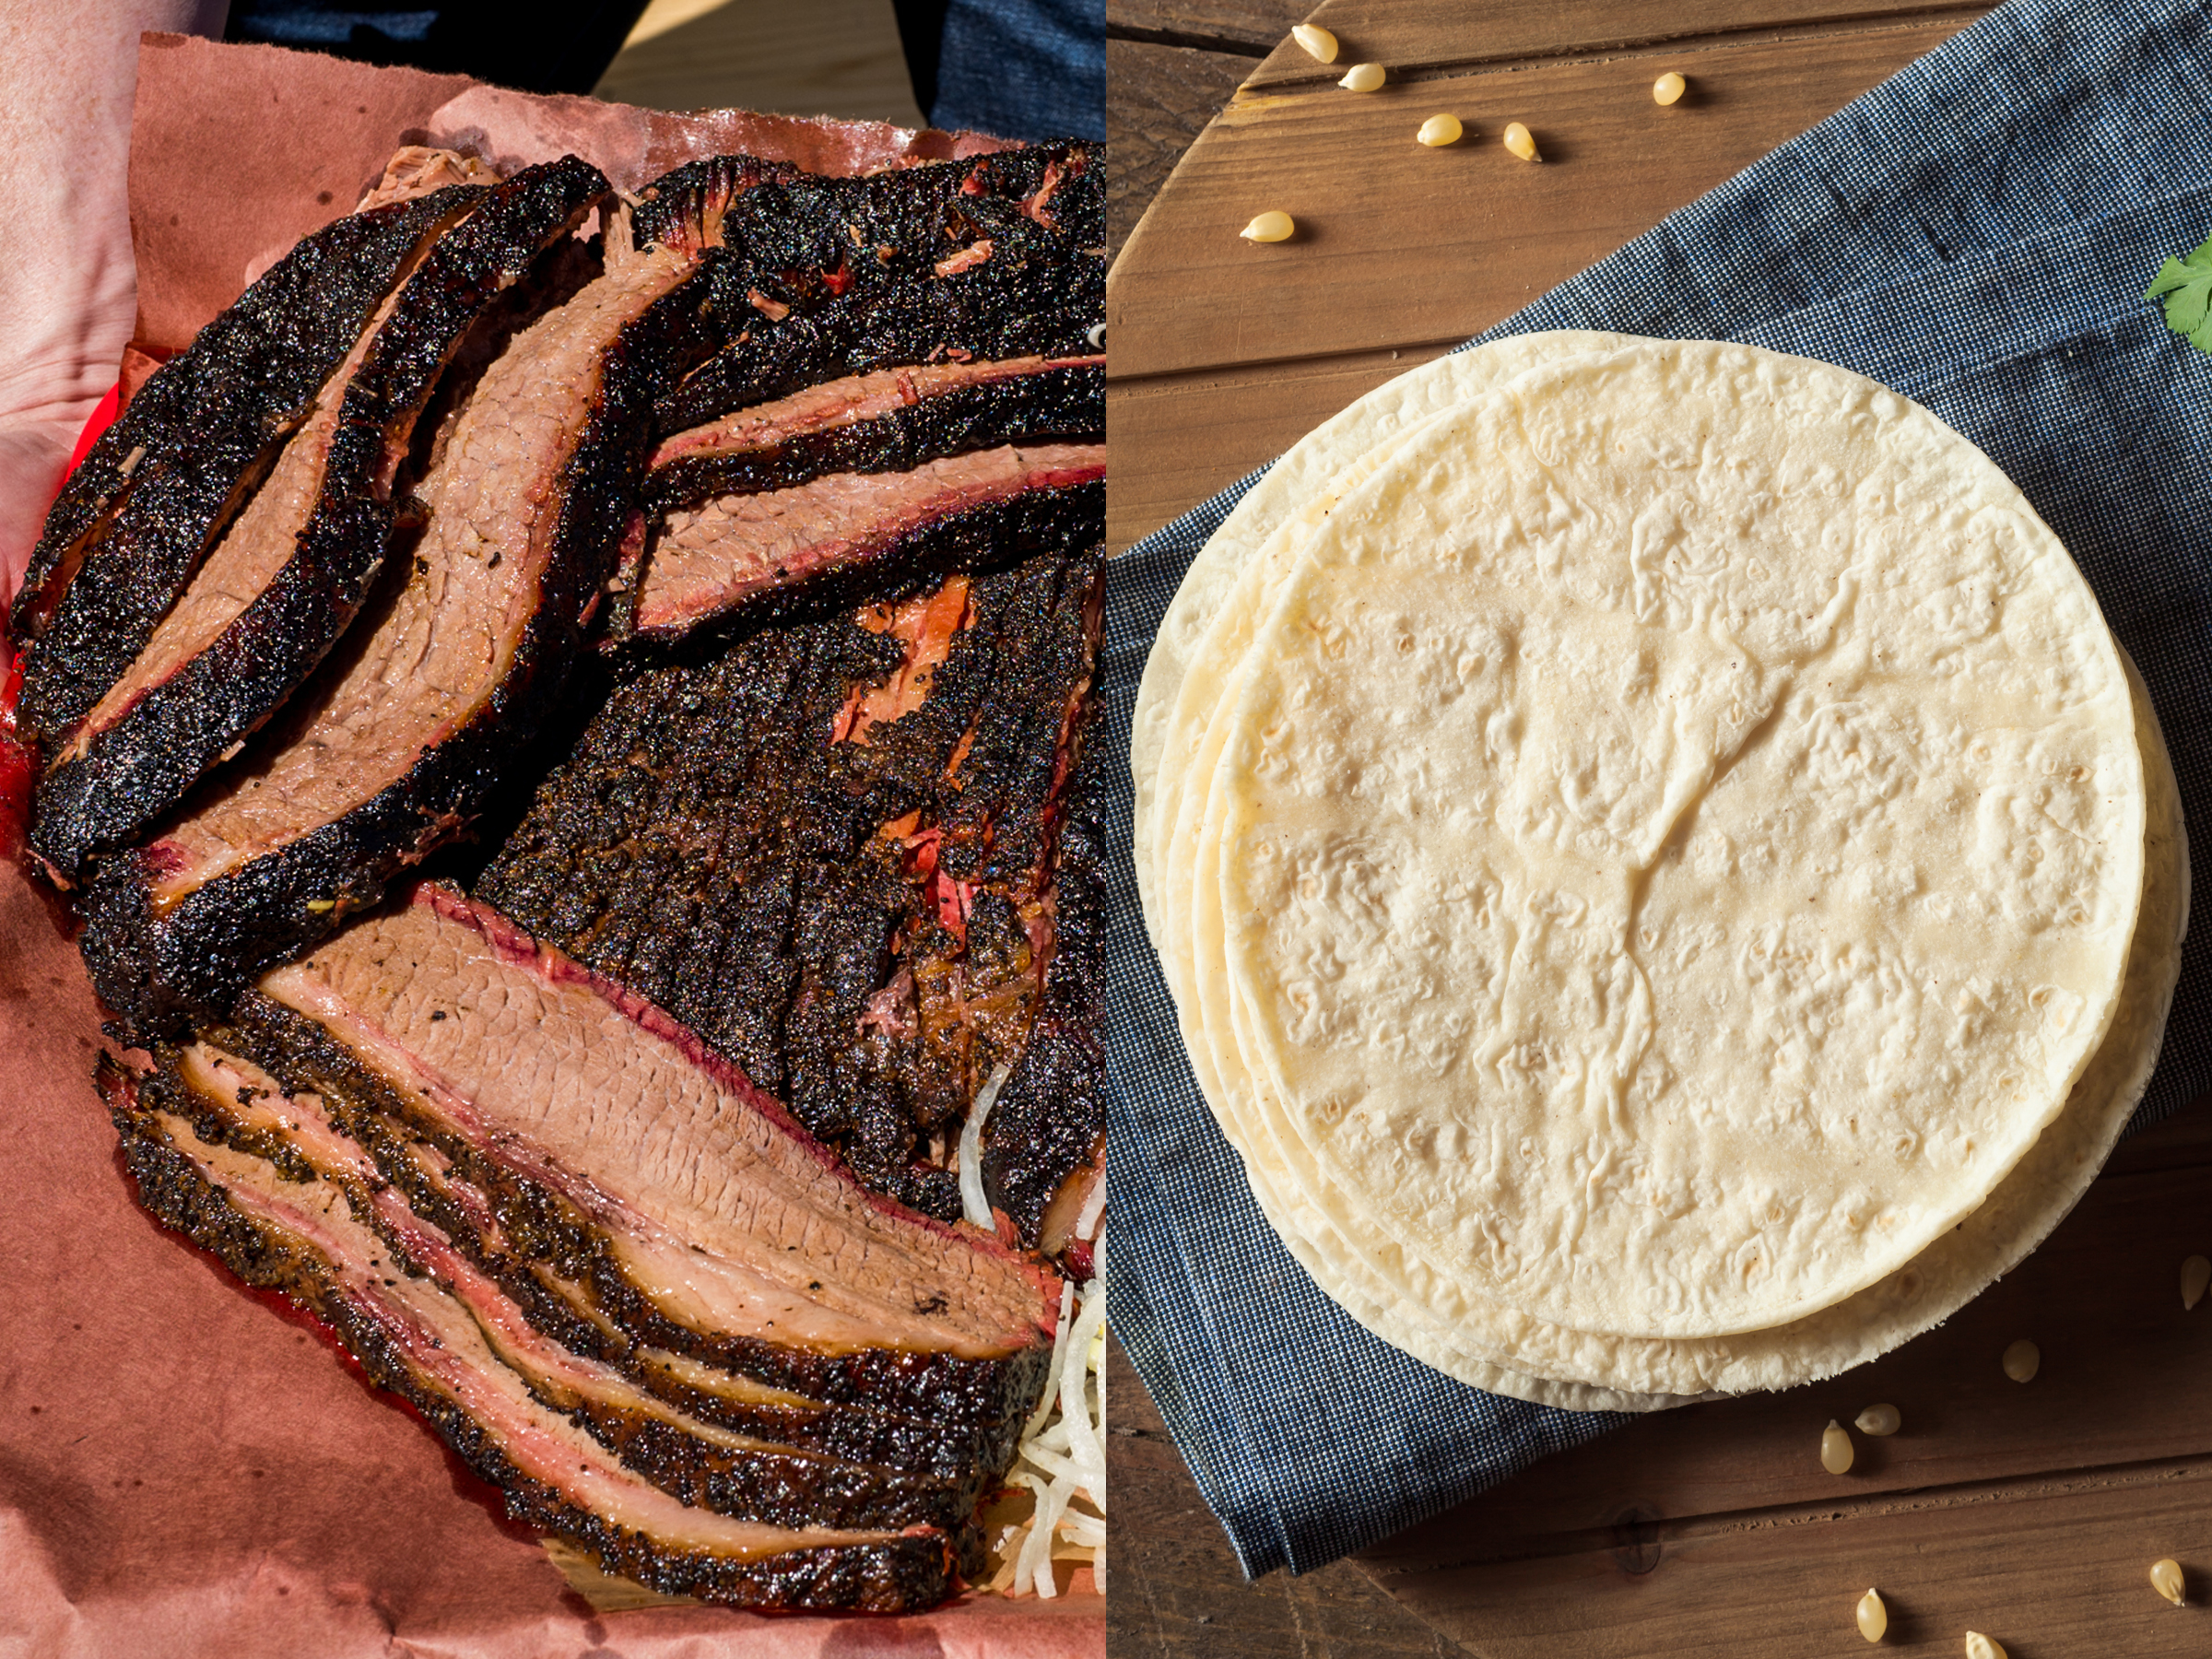 Brisket from Franklin Barbecue; stock image of white corn tortillas